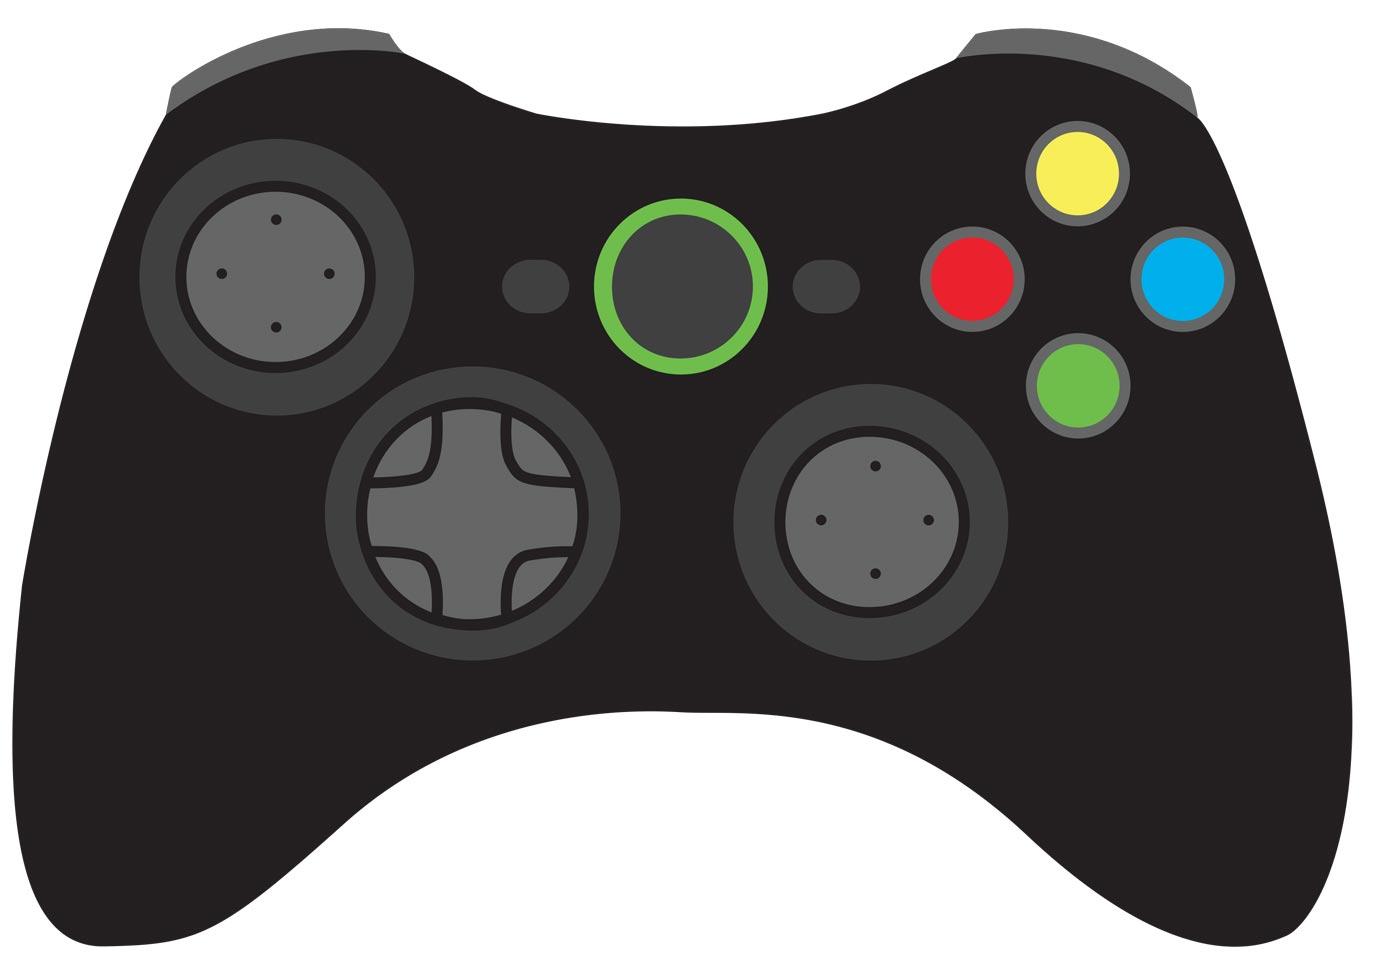 Game Controller Vector | Free Vector Art at Vecteezy!